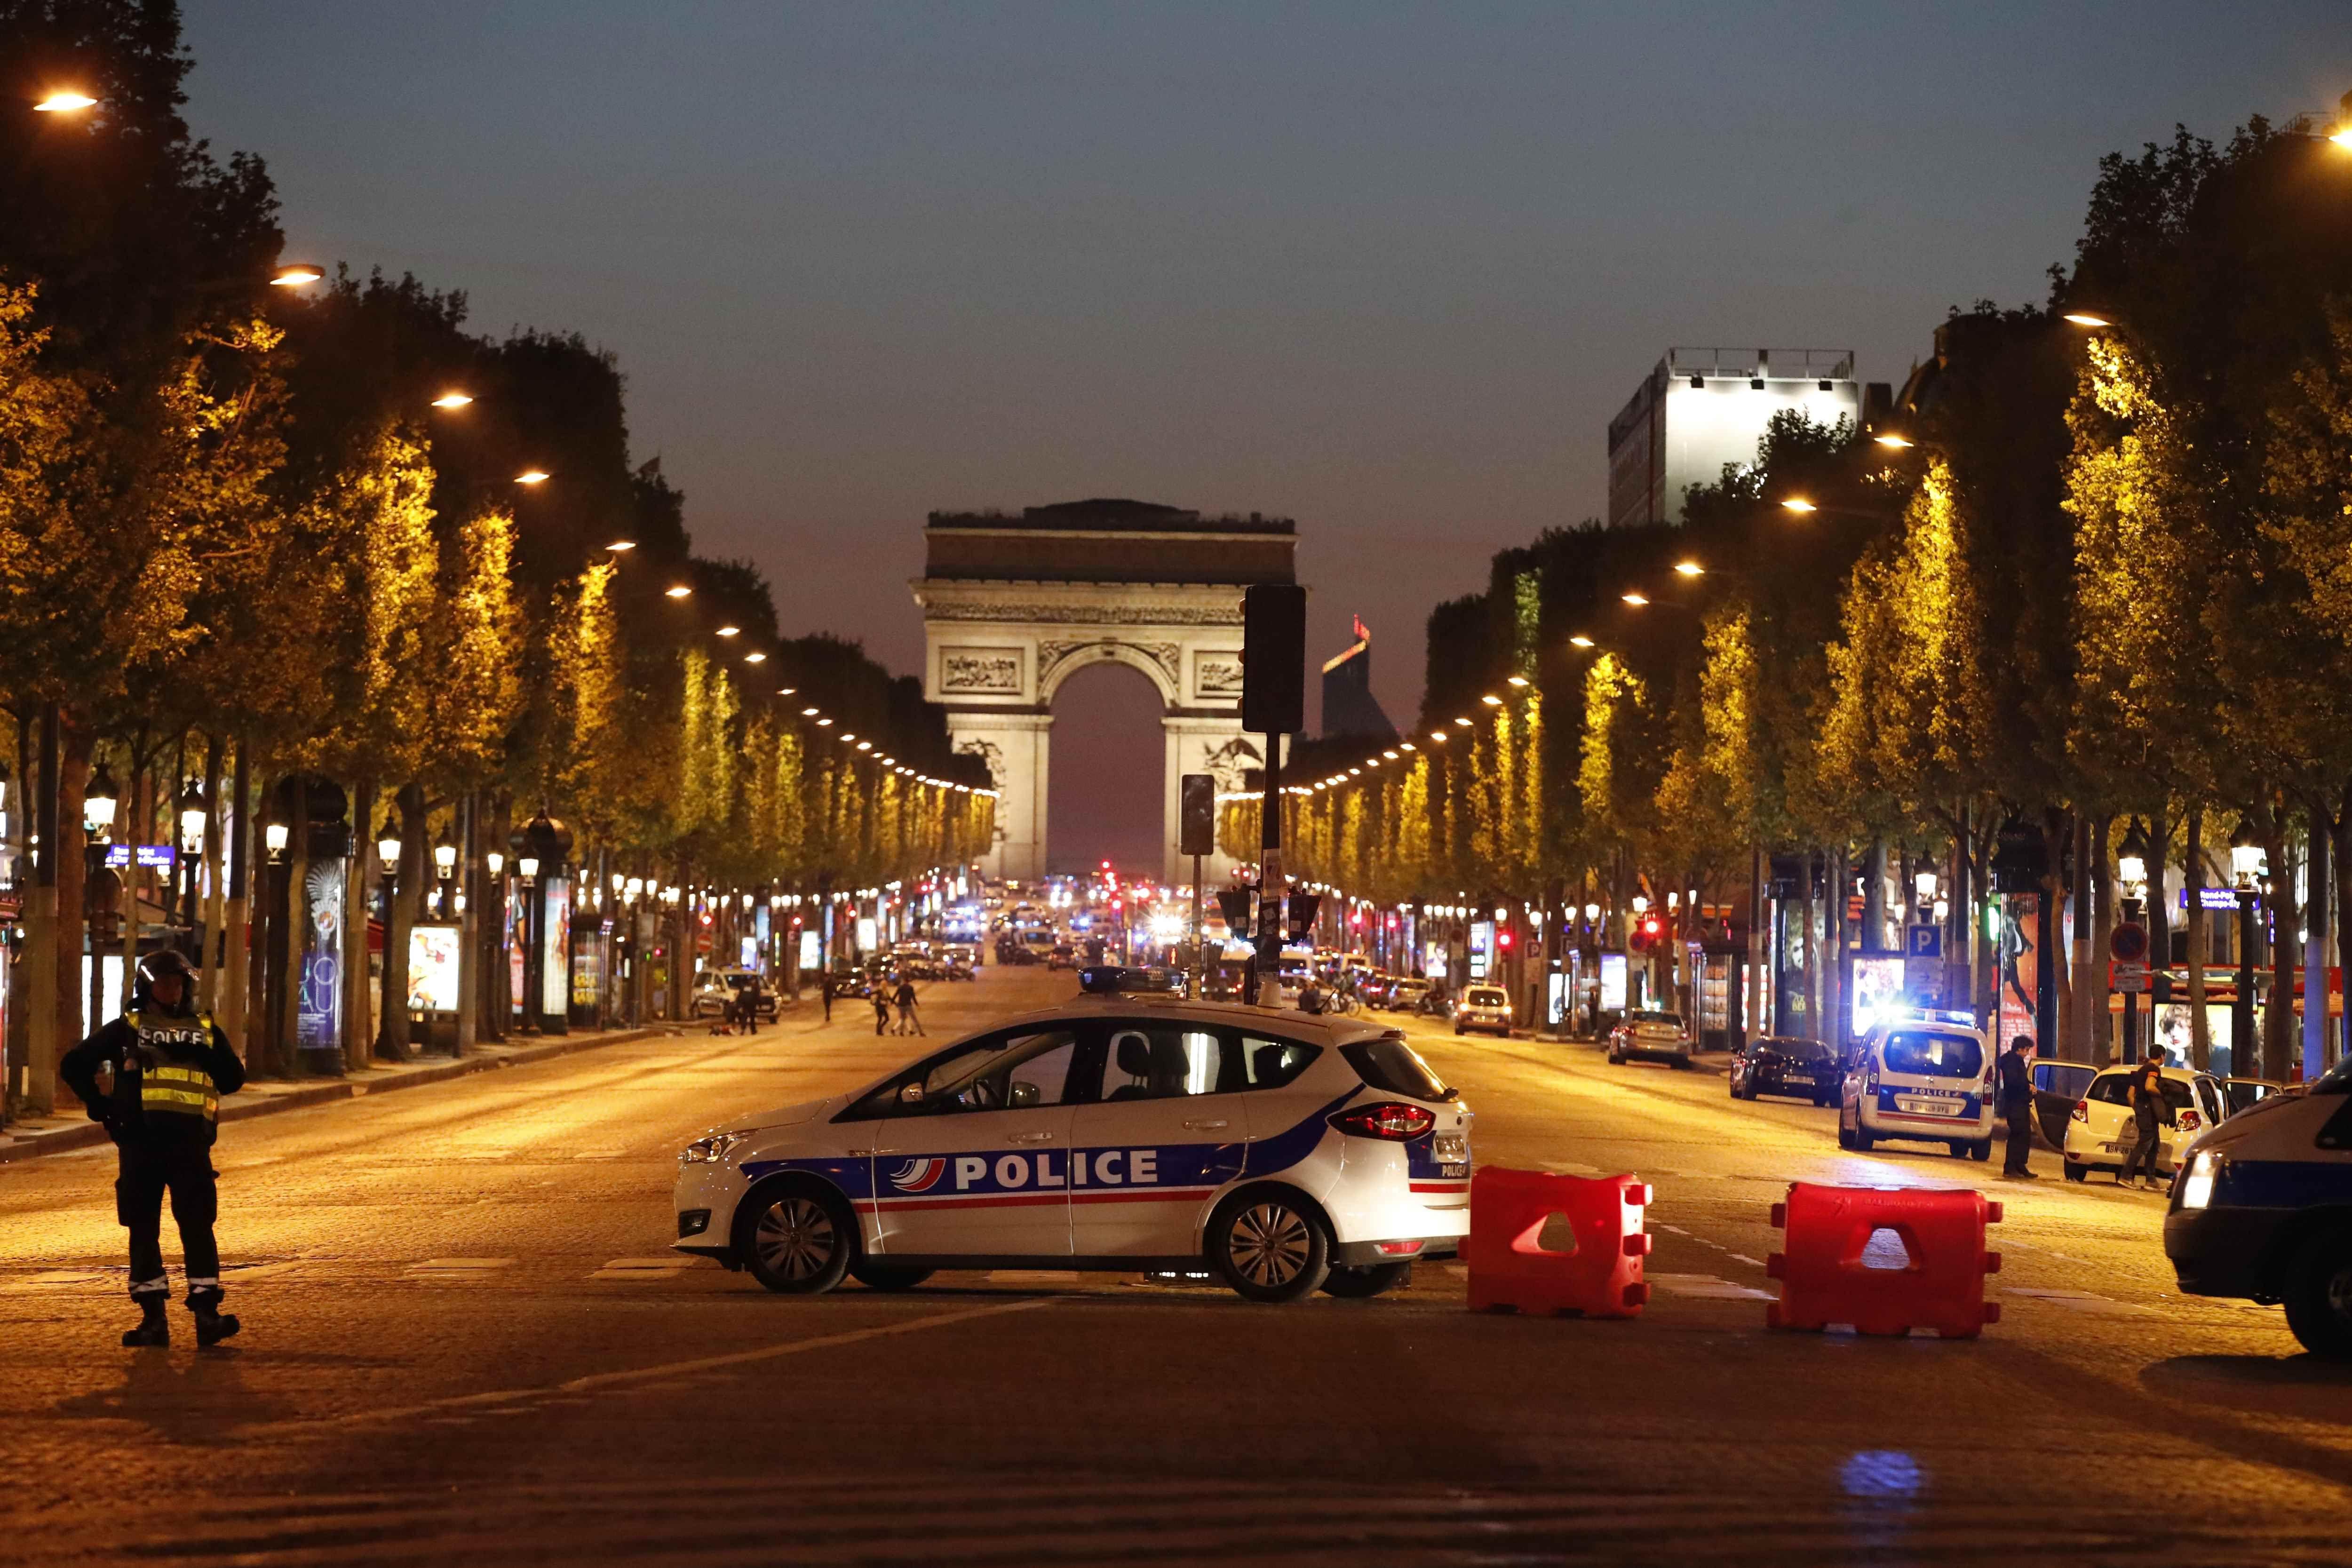 Viaturas fecharam a avenida Champs-Élysées / Christian Hartmann/Reuters